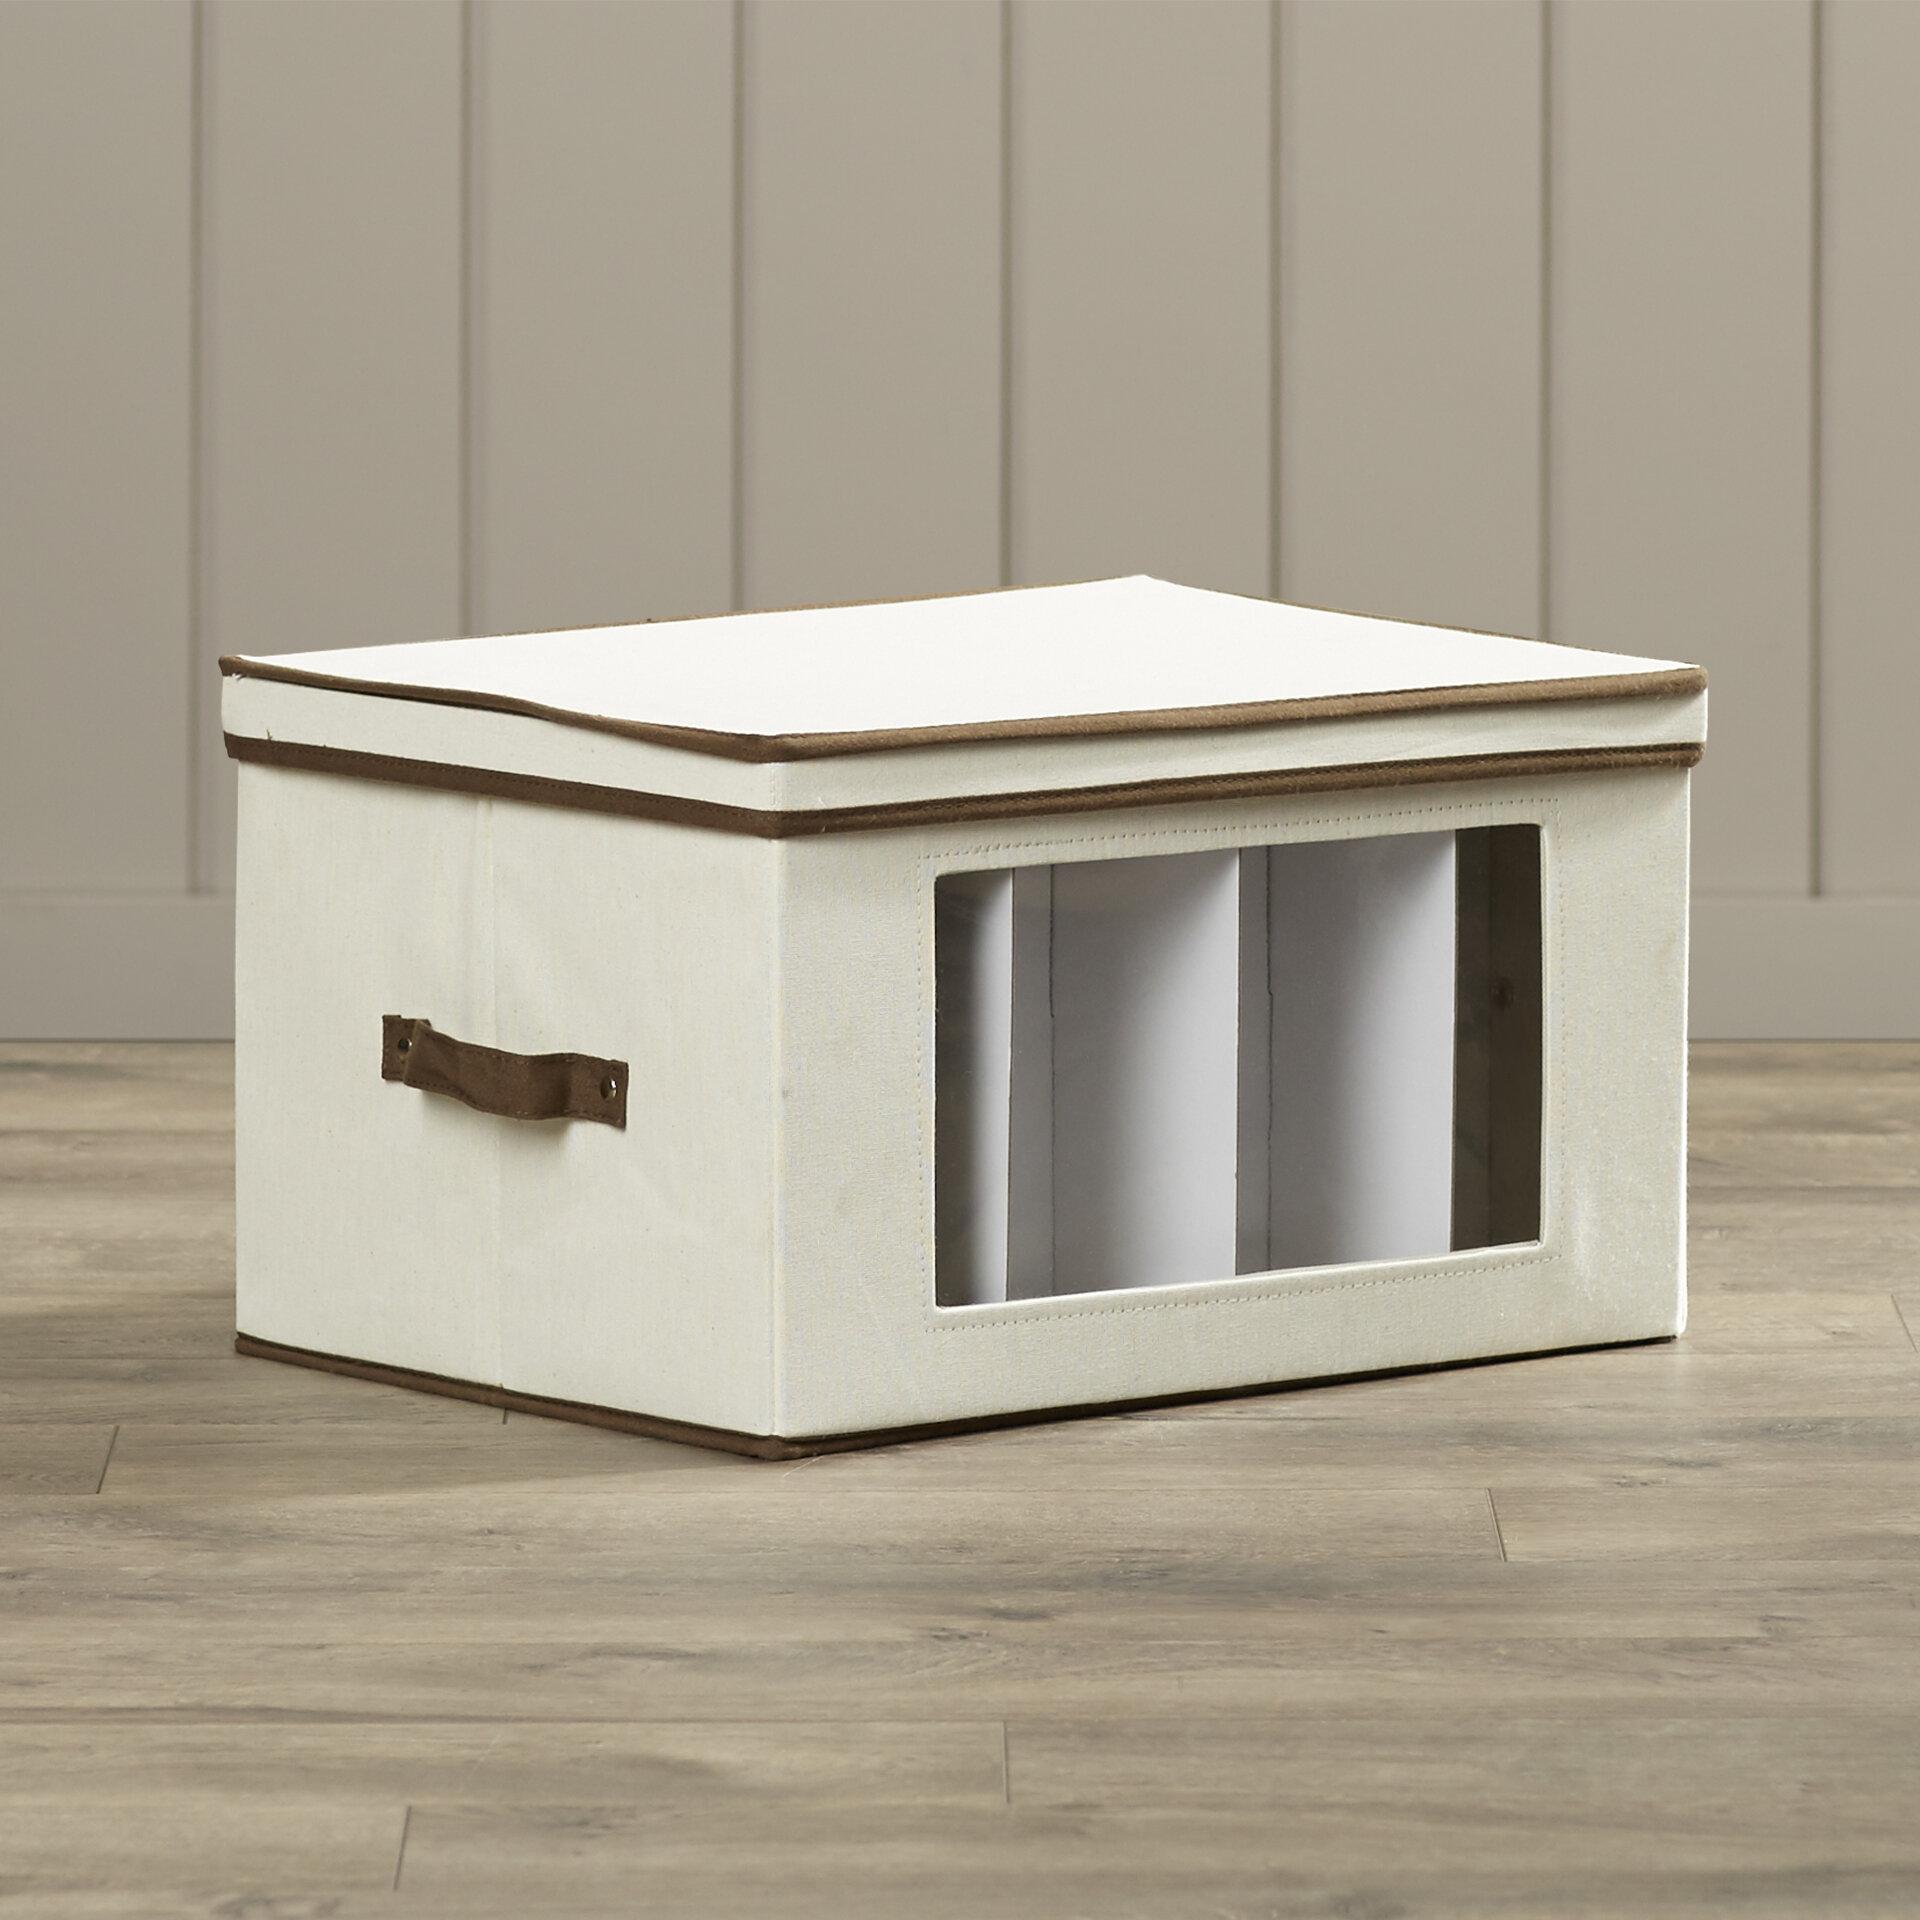 Gentil Rebrilliant Canvas Tall Window Storage Box U0026 Reviews | Wayfair